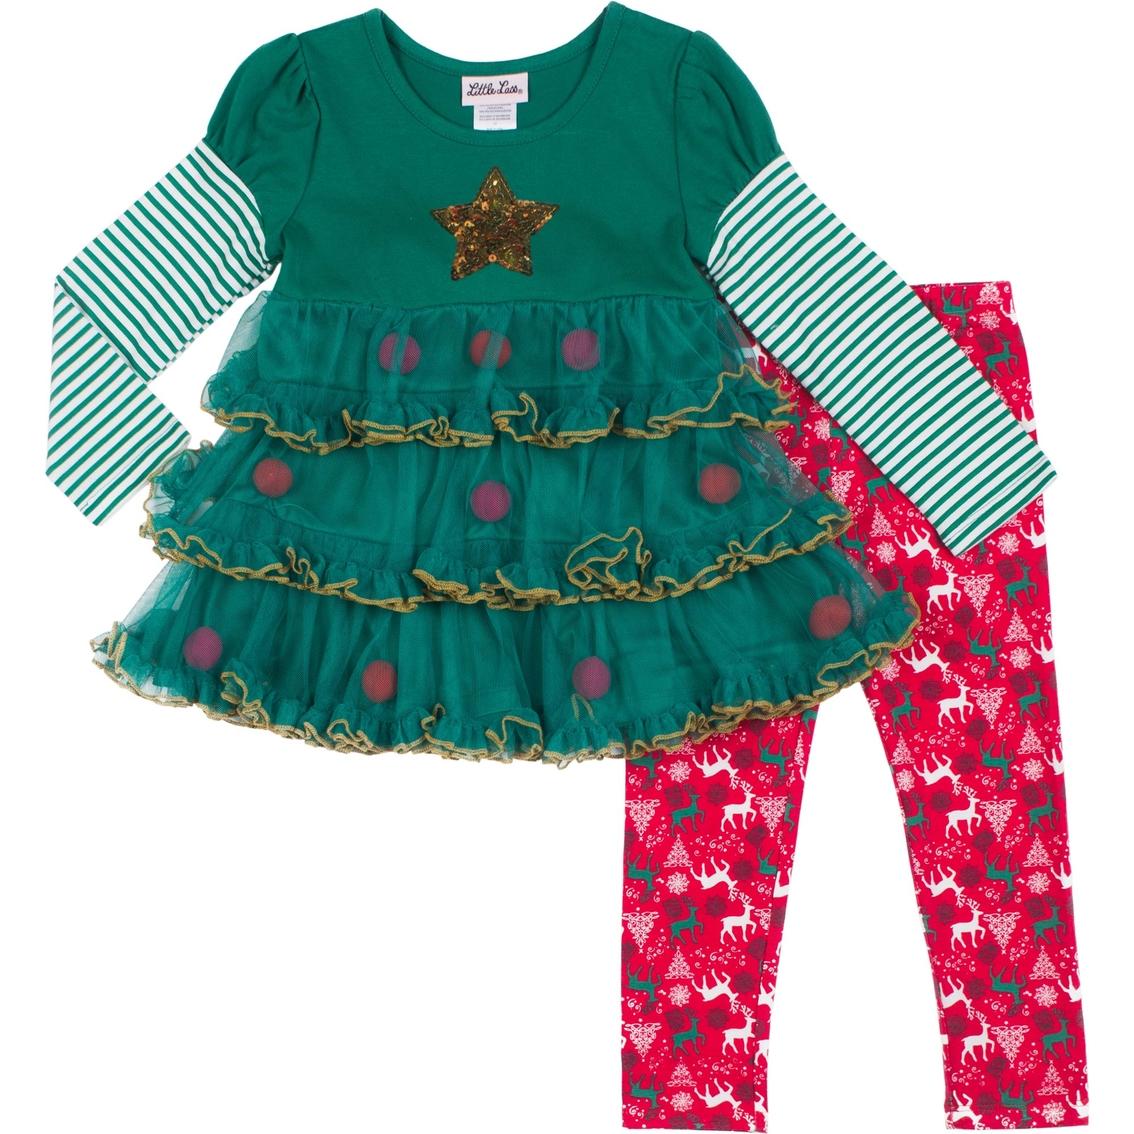 754a90f0417ae Little Lass Little Girls 2 Pc. Christmas Leggings Set | Girls 4-6x ...